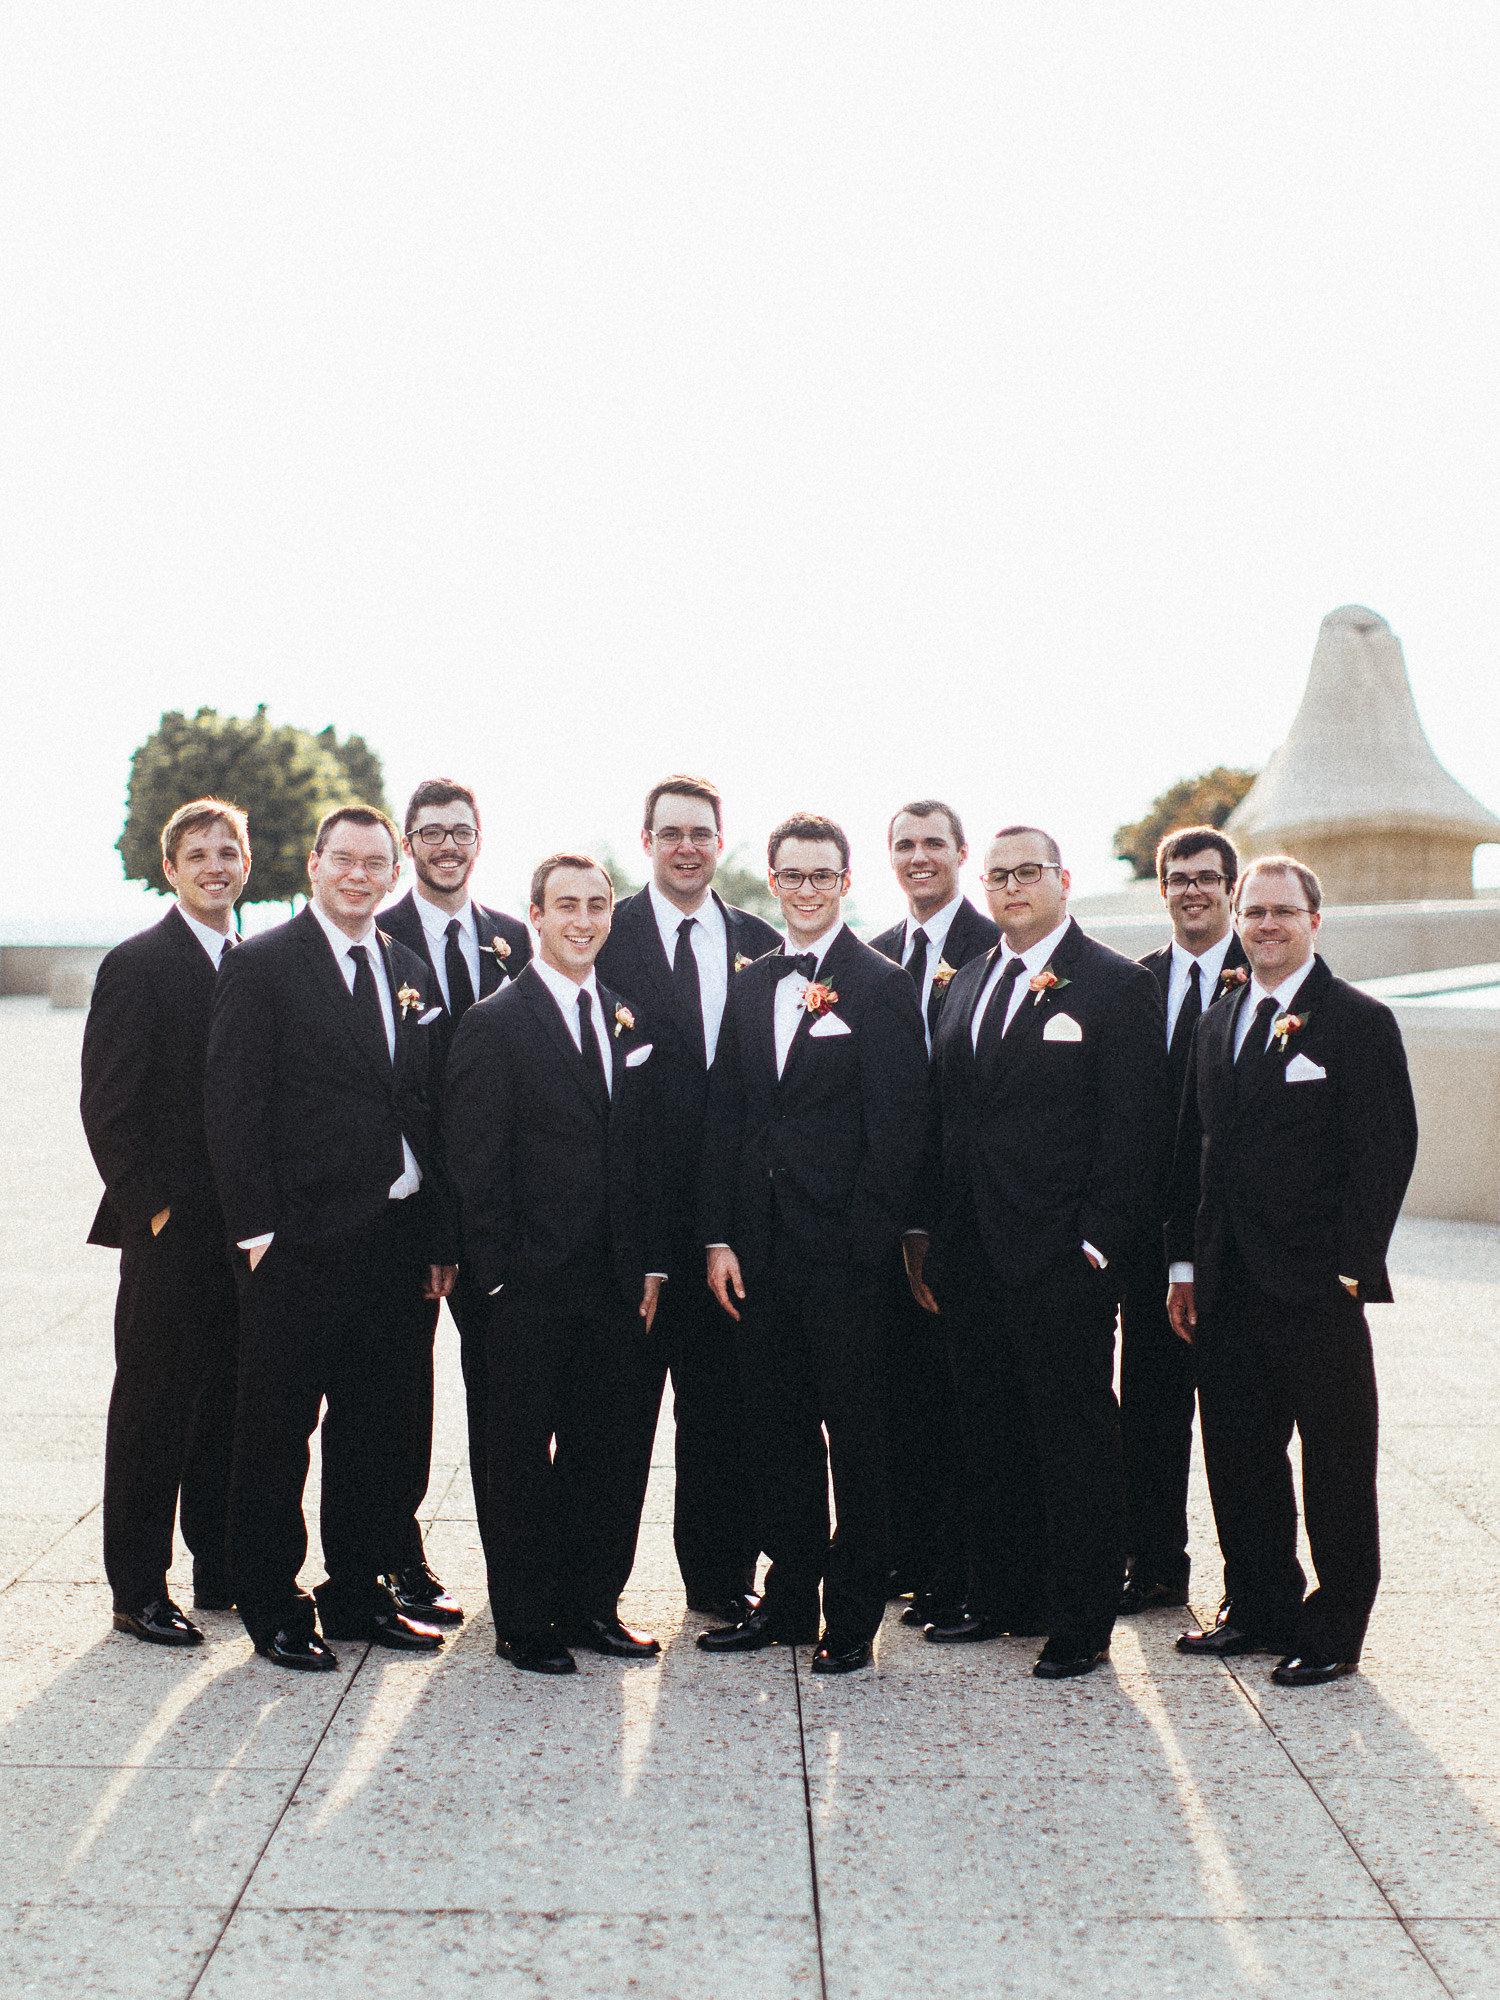 Kansas City Groomsmen